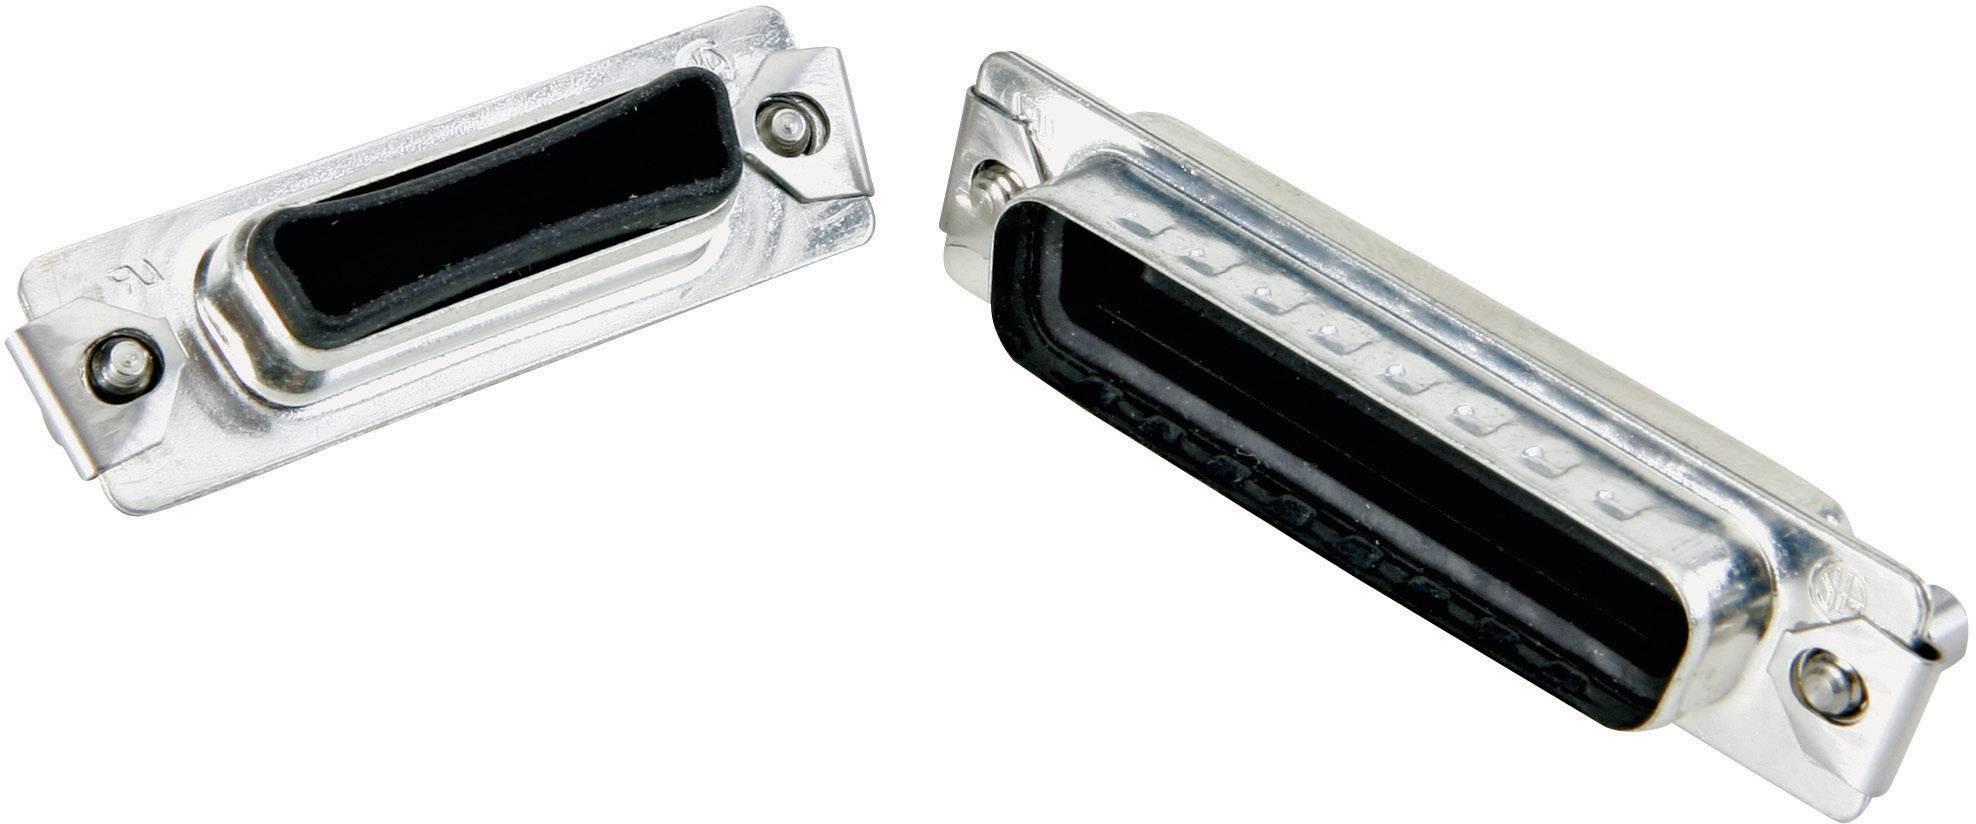 D-SUB krytka IP67 pro D-SUB zásuvka 25pólová Conec 165X14739X, 165X14739X, stříbrná, 1 ks